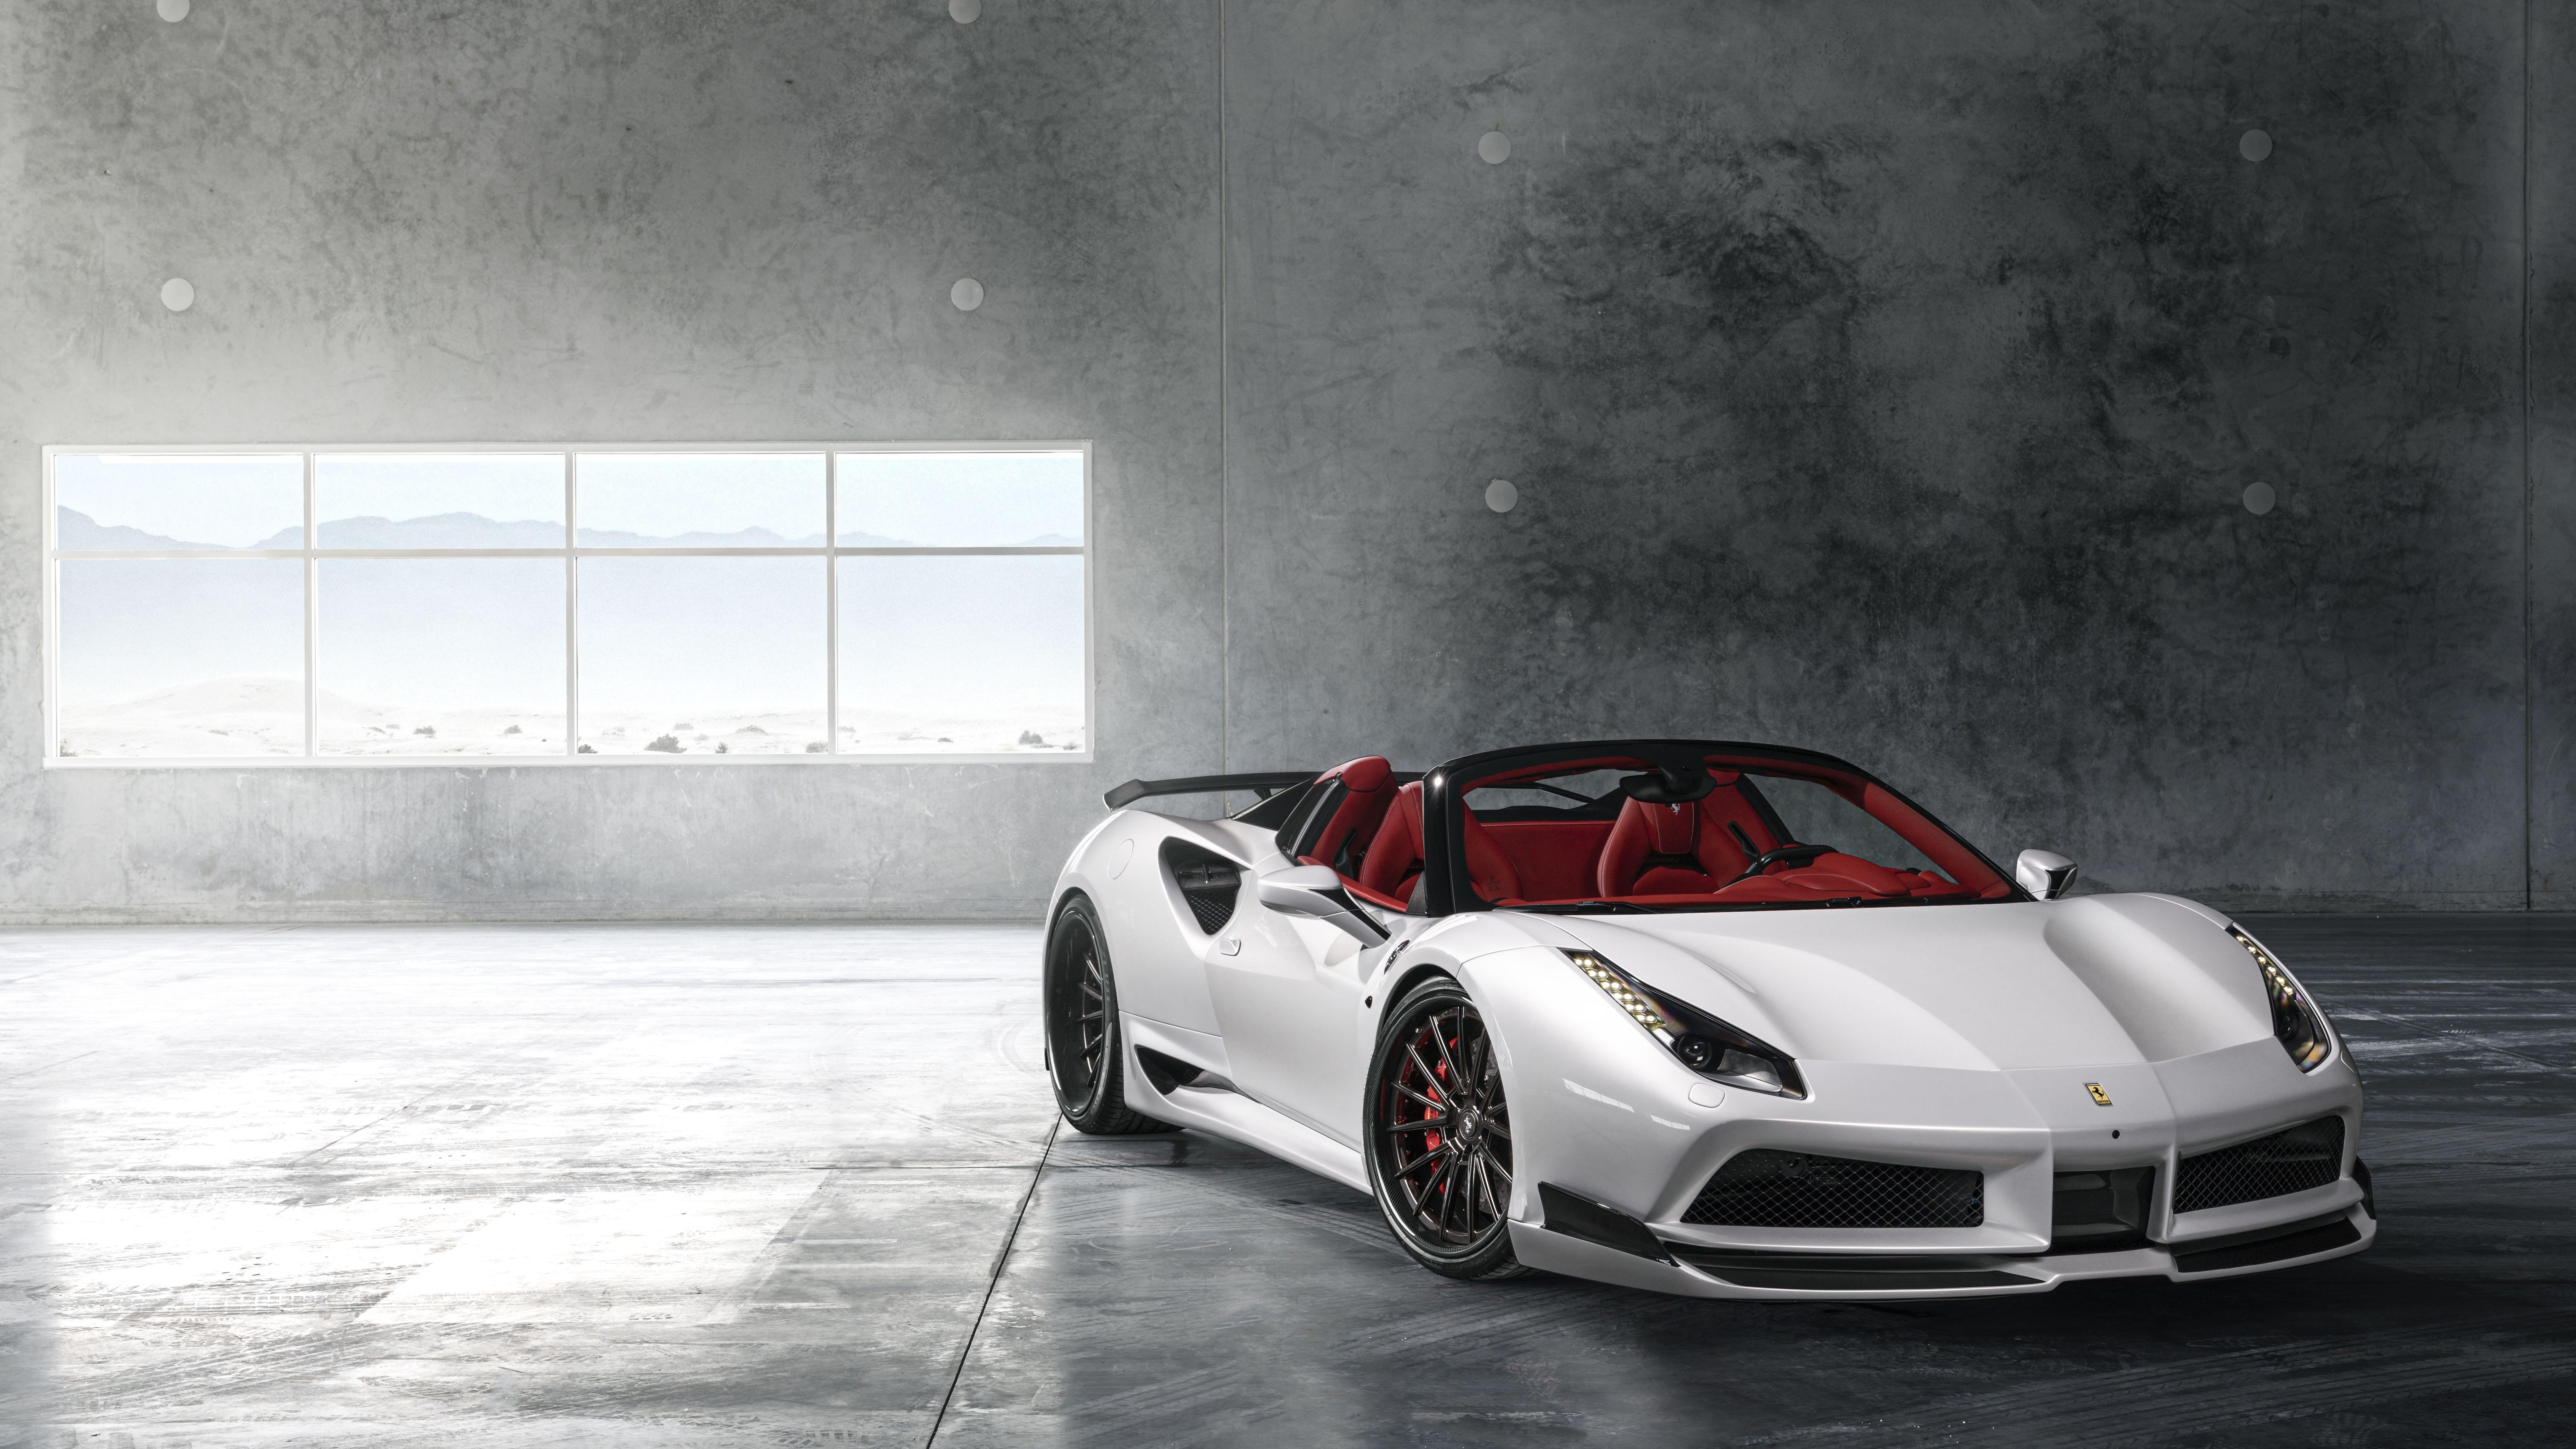 8k Ultra Hd Ferrari Wallpapers Top Free 8k Ultra Hd Ferrari Backgrounds Wallpaperaccess